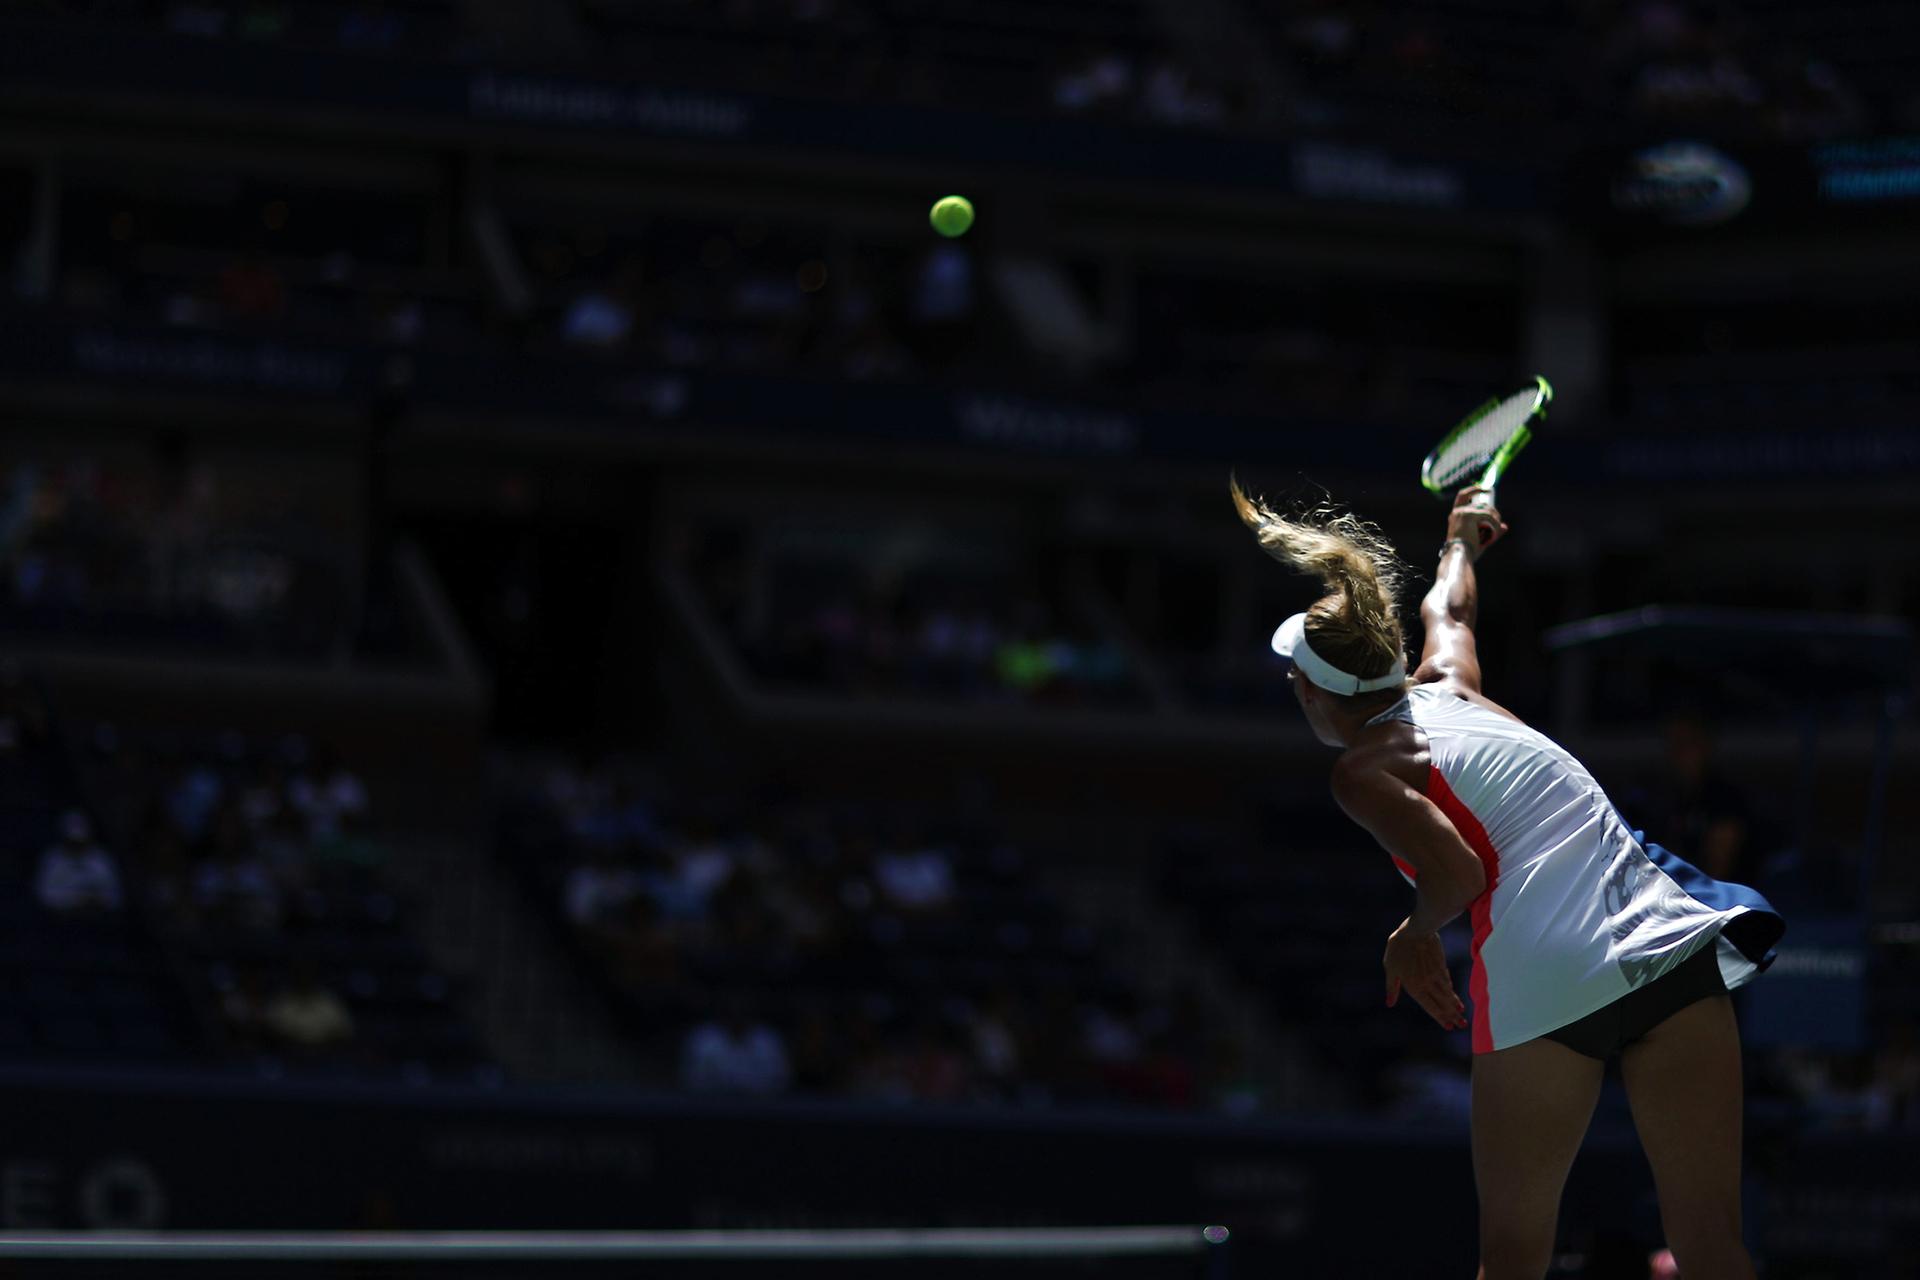 020916_Tennis_USOpen_1273